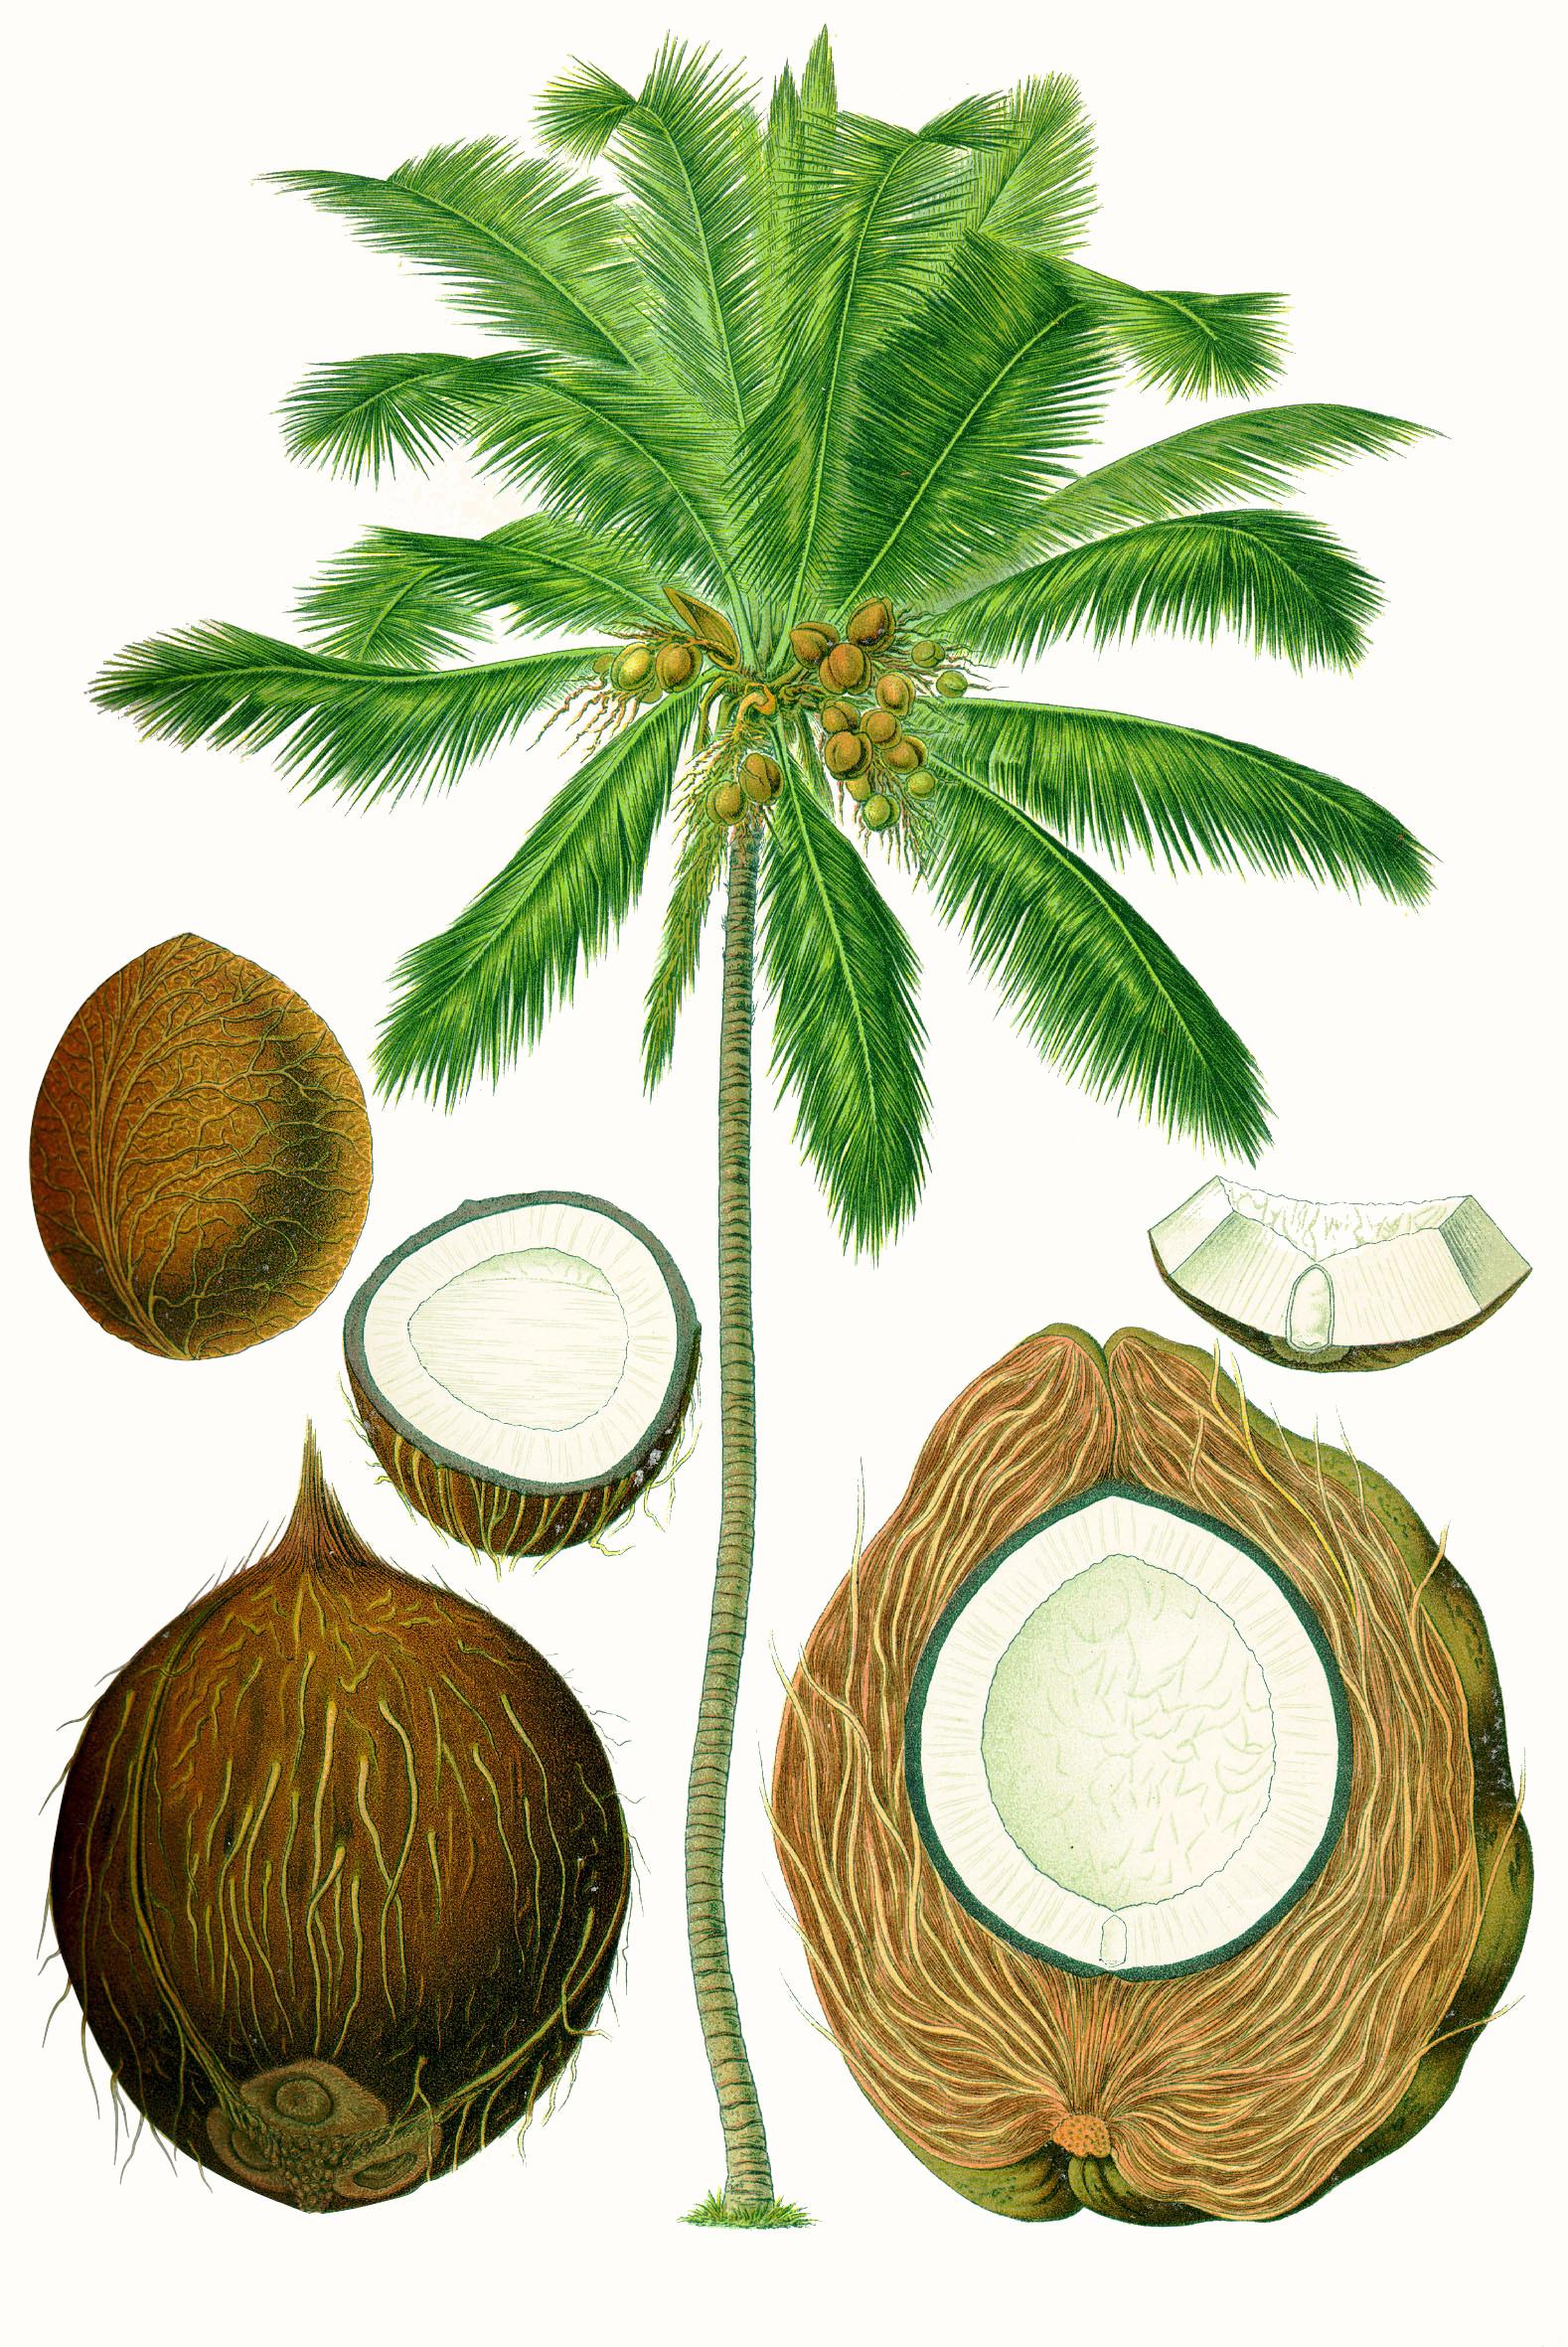 File:Cocos nucifera - Köhler–s Medizinal-Pflanzen-187.jpg